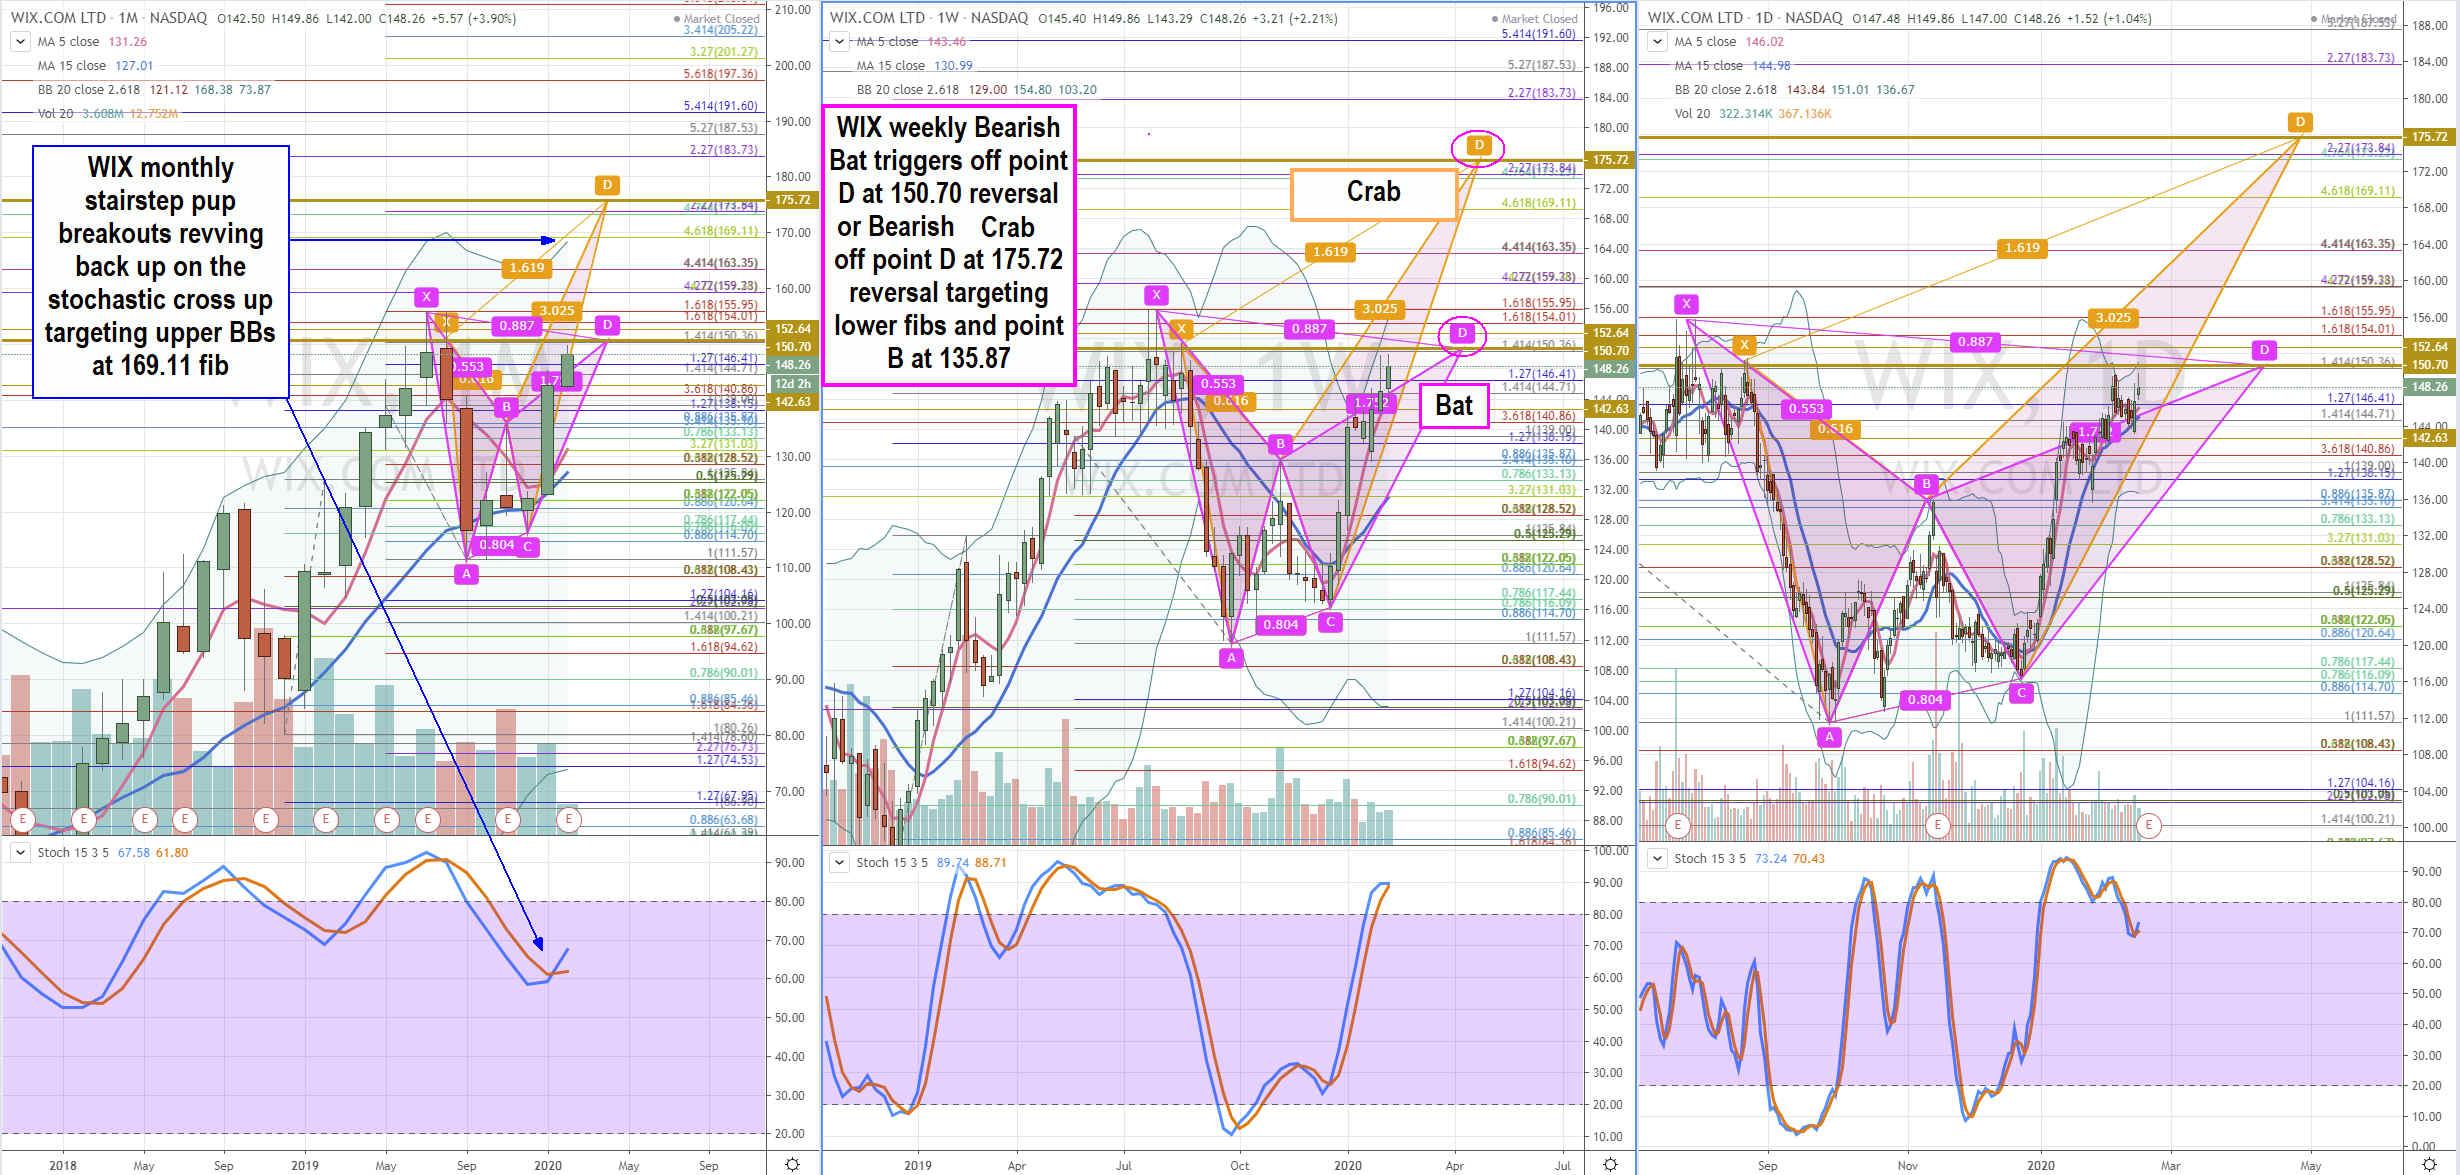 Trading Blueprint for Wix.com (WIX) Stock